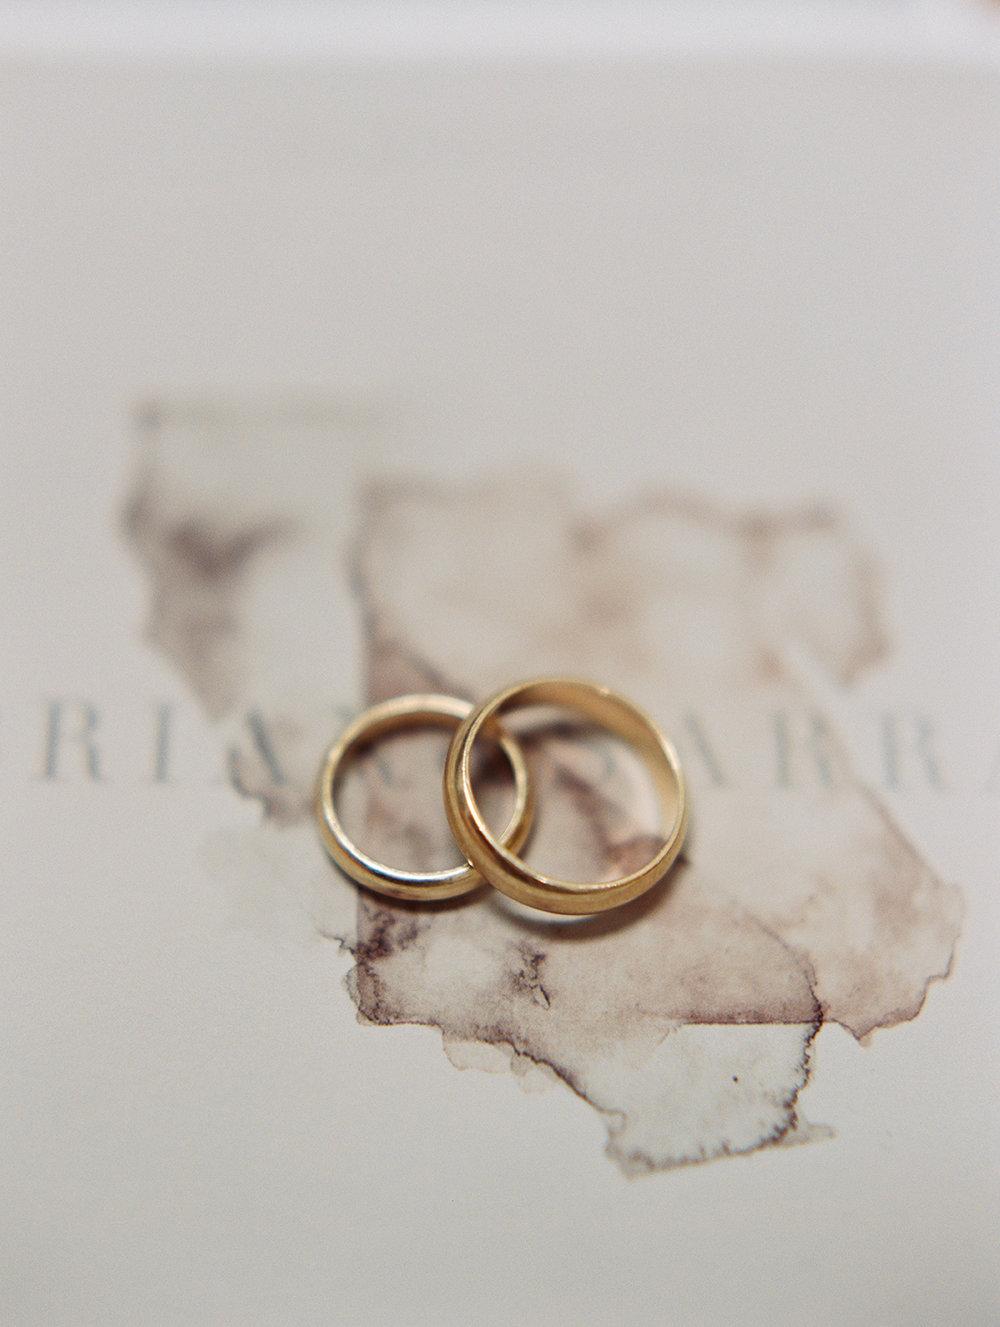 050-brian-sarra-los-angeles-wedding-brumley-wells-photography.jpg